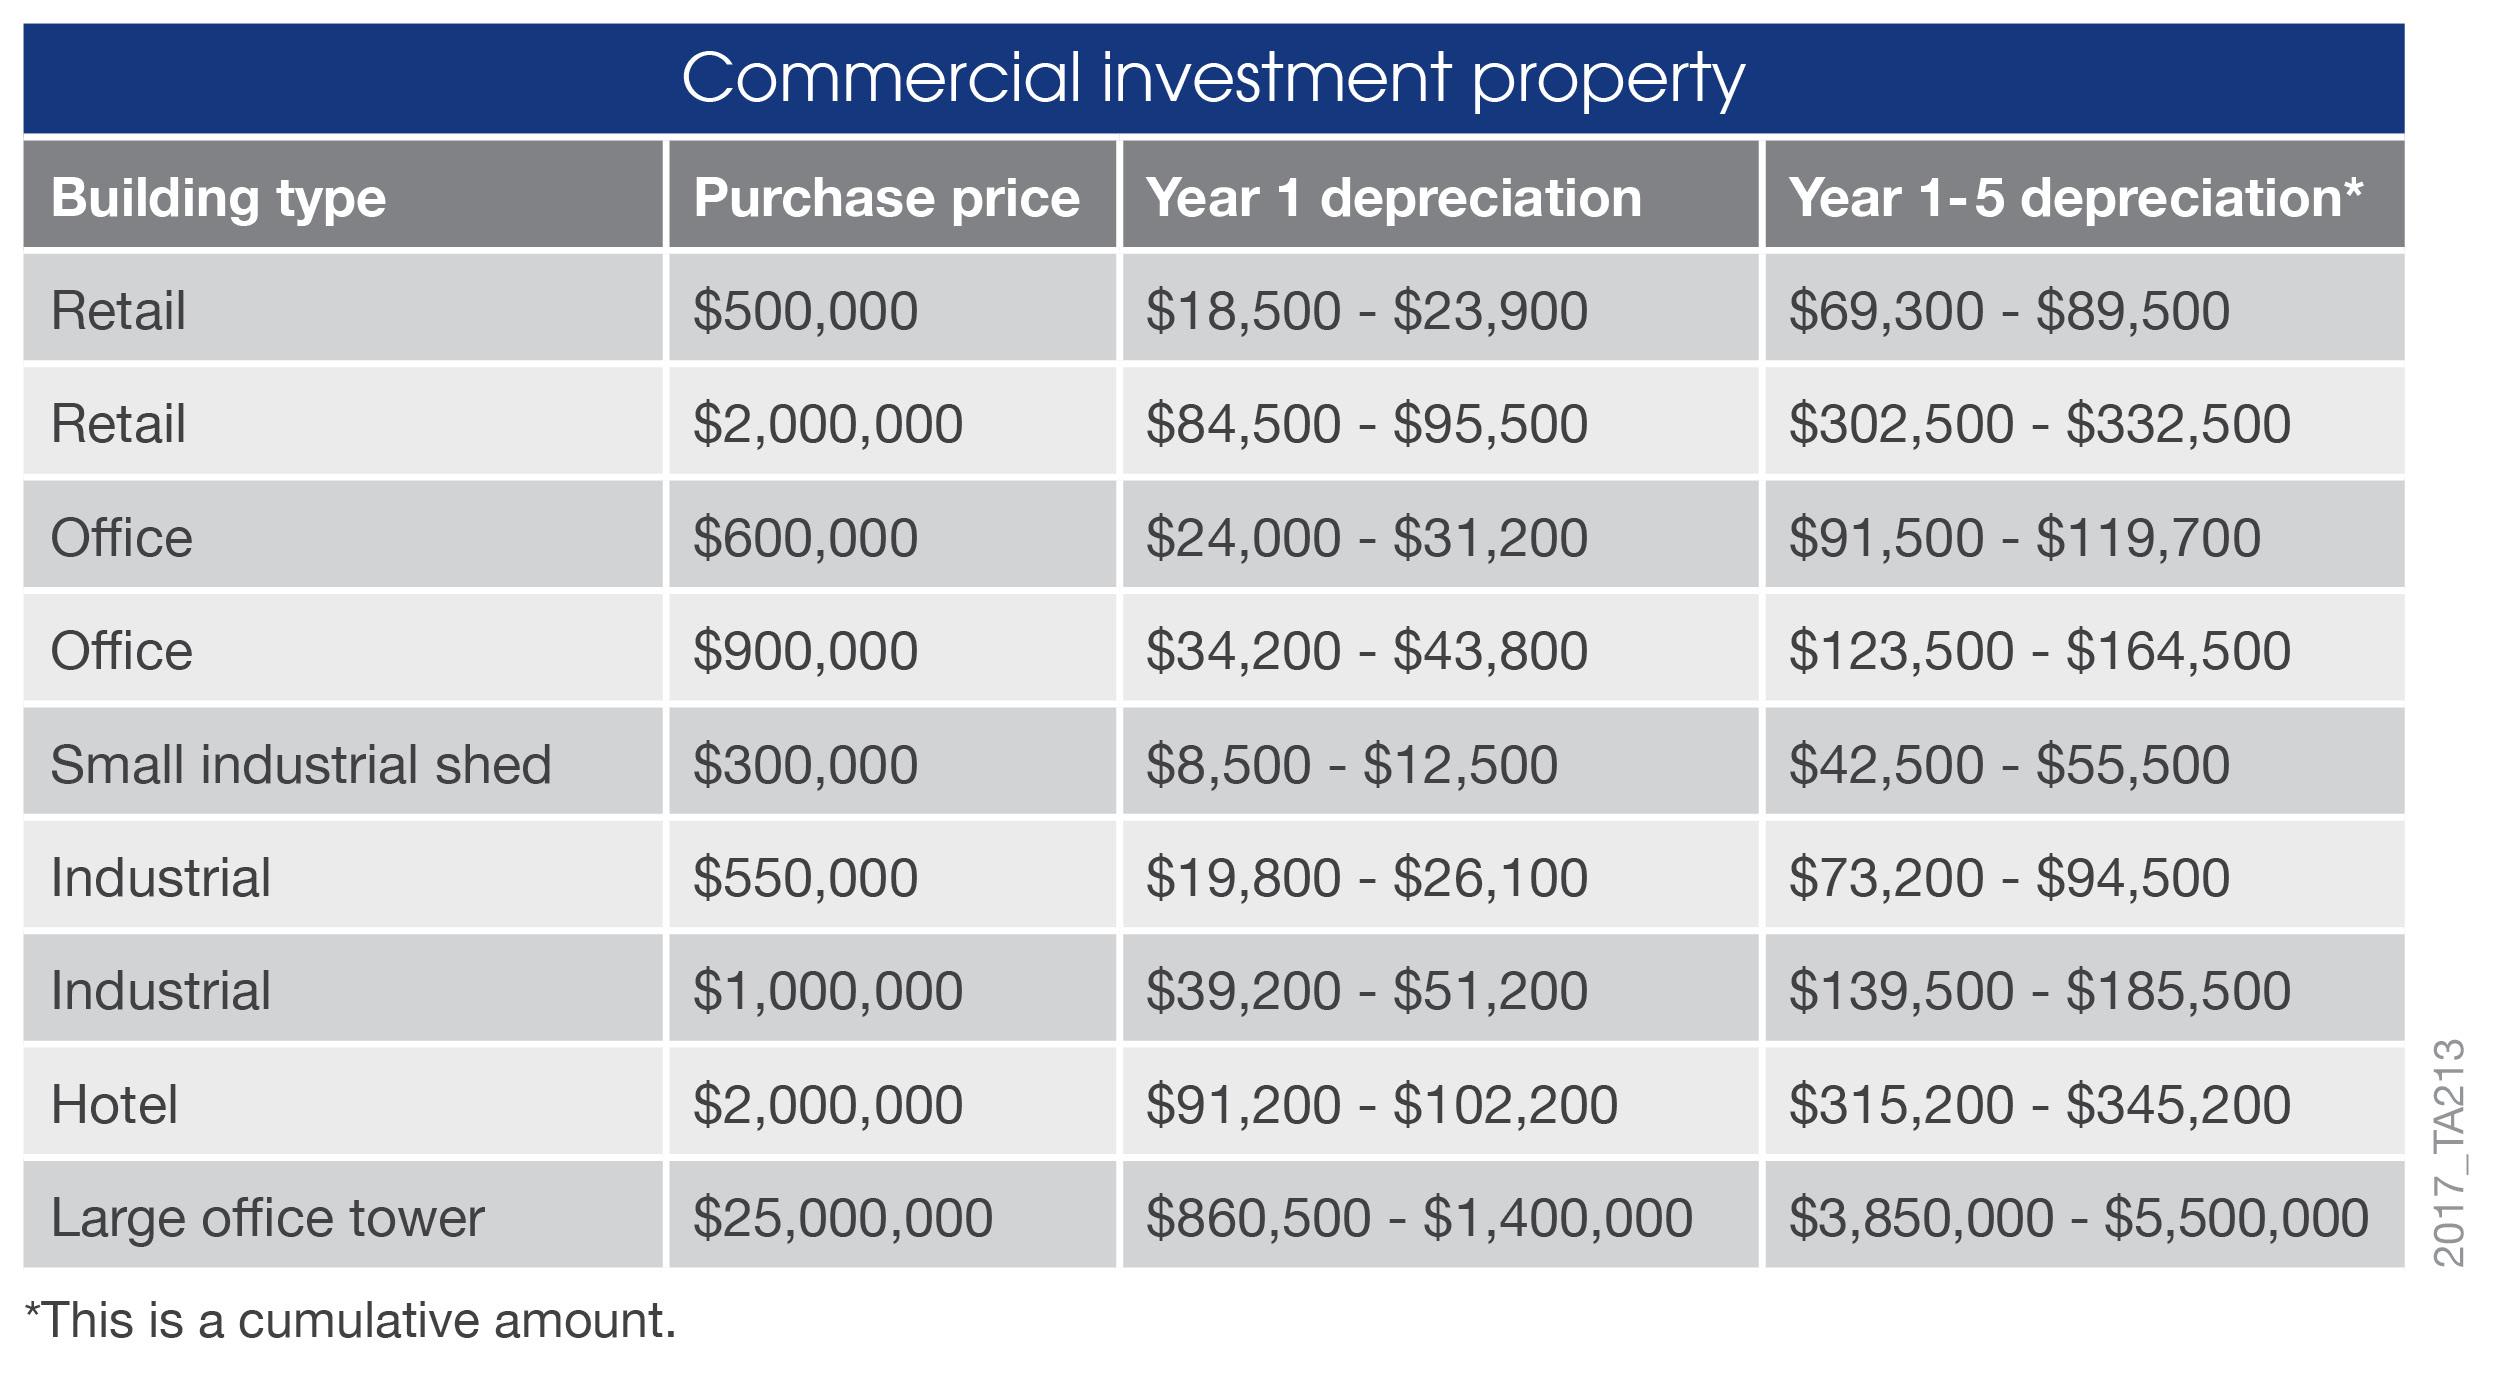 Property Depreciation | Richardson & Wrench